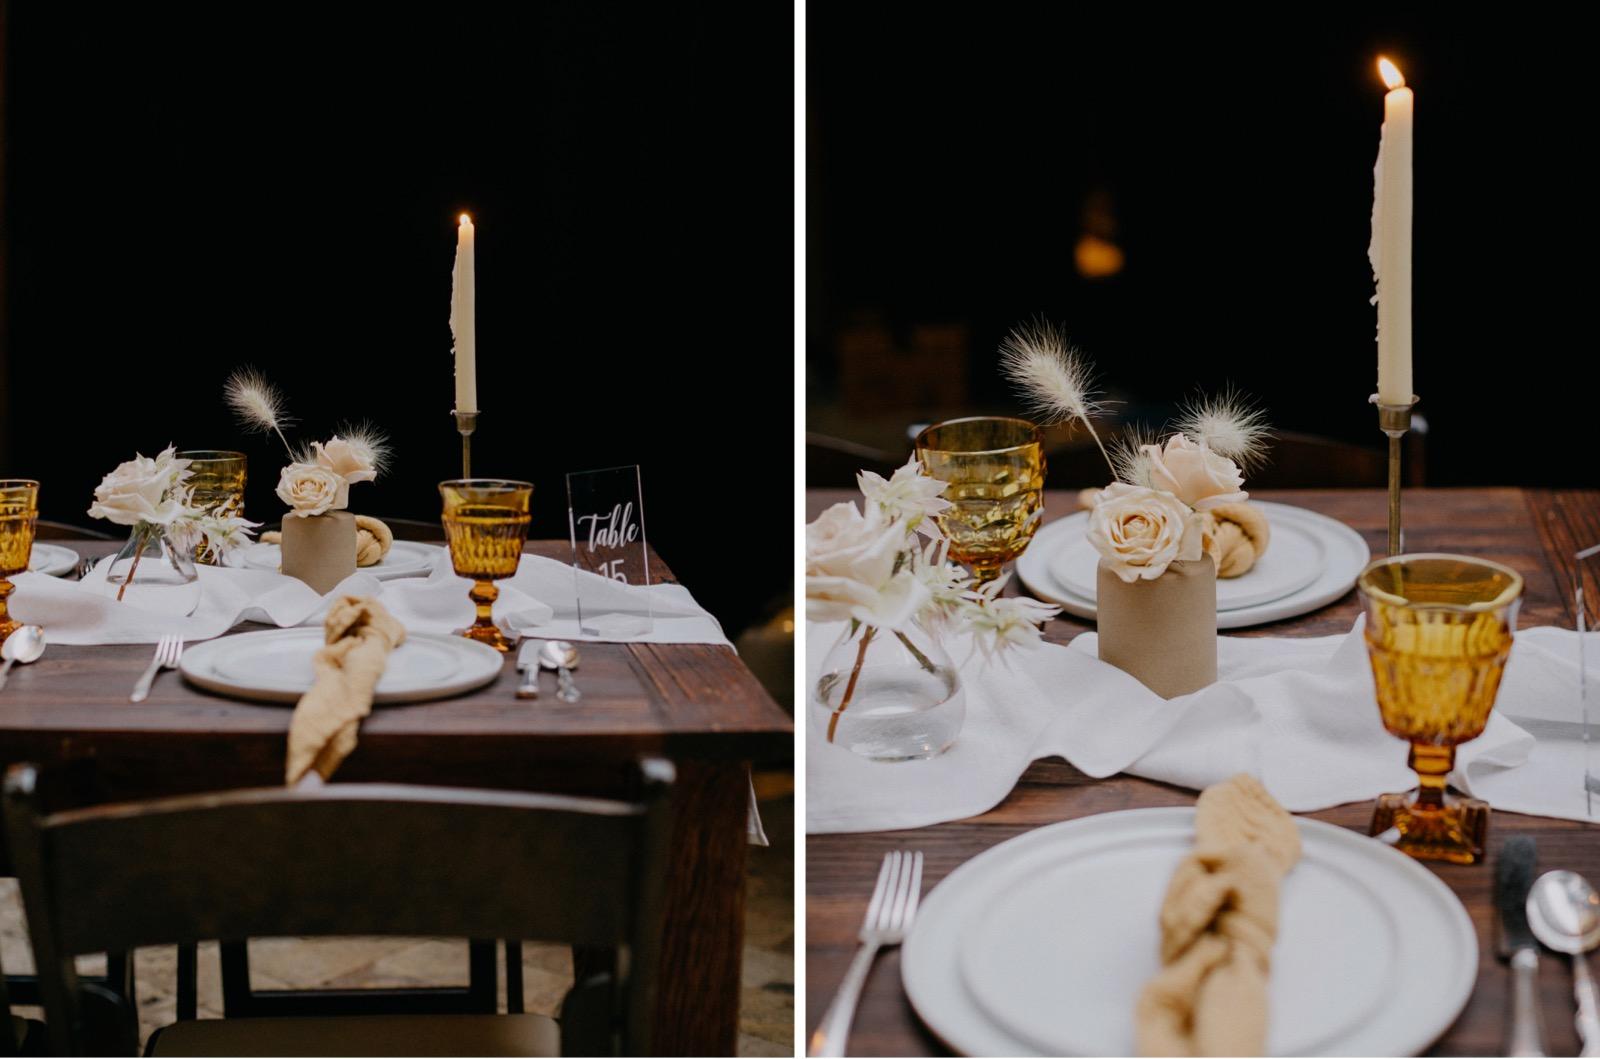 106_Emily & Jeff Wedding 0940_Emily & Jeff Wedding 0939_the-waterfall-lodge_forest_wedding_ben-lomond_intimate